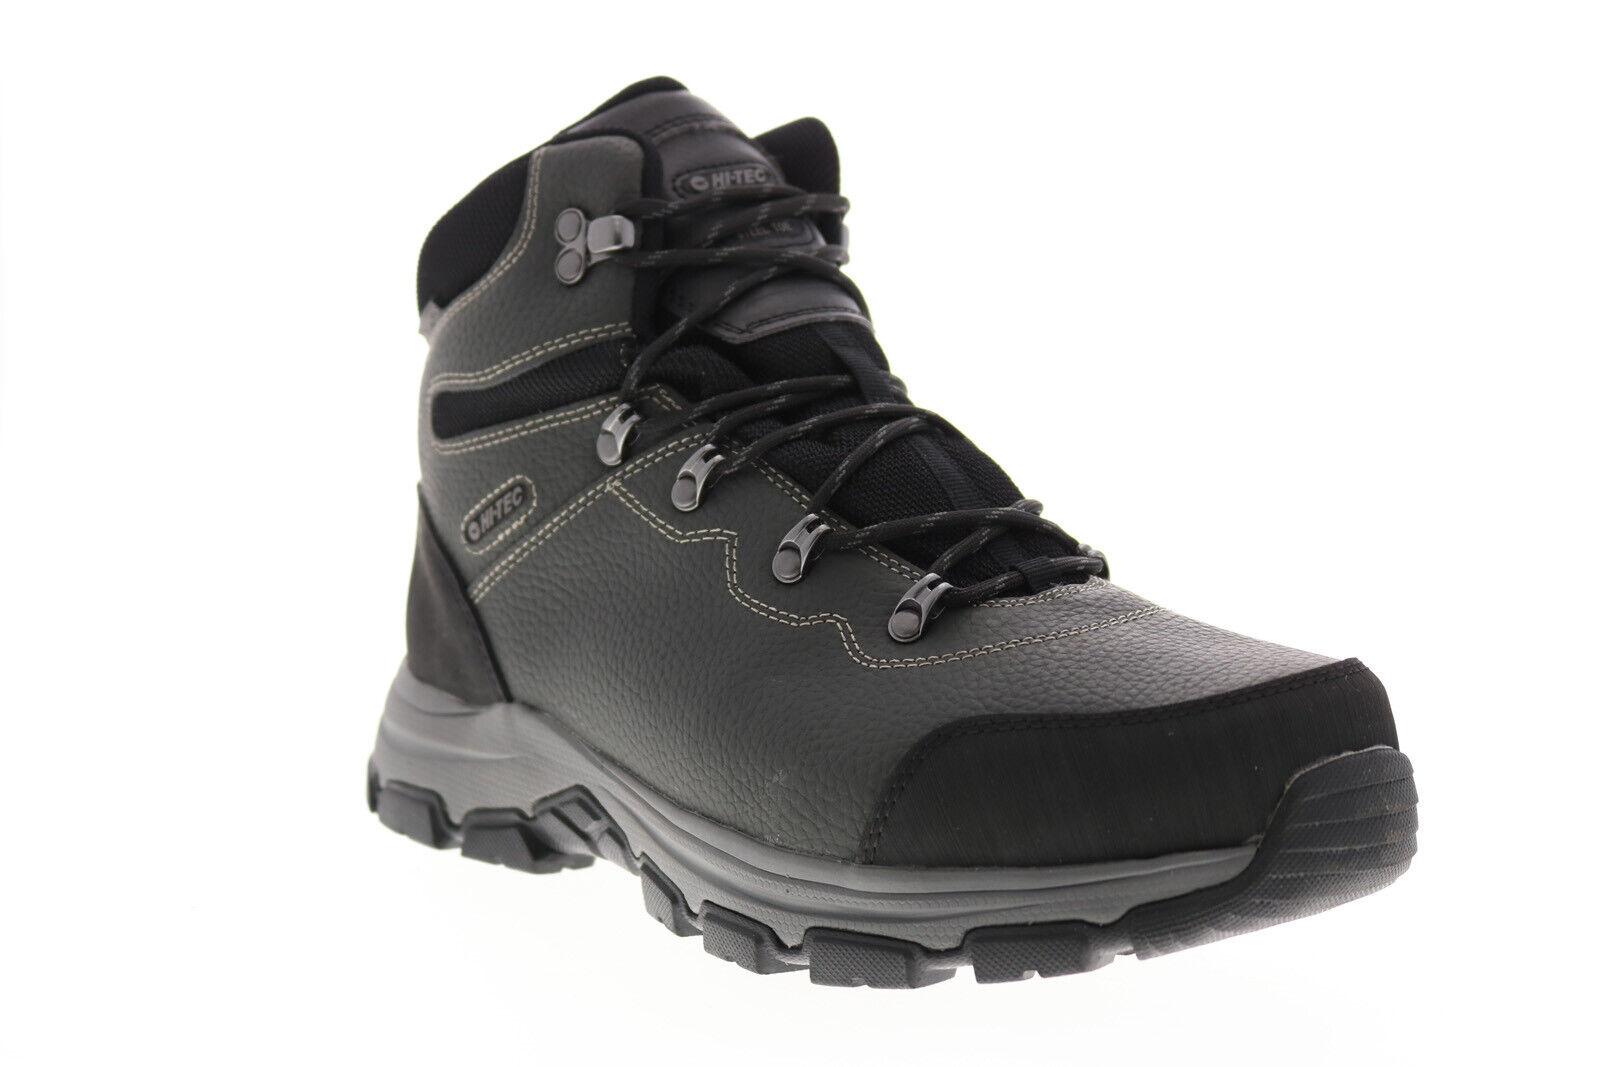 Hi-Tec Austin Waterproof Steel Toe 57047 Mens Gray Leather Work Boots